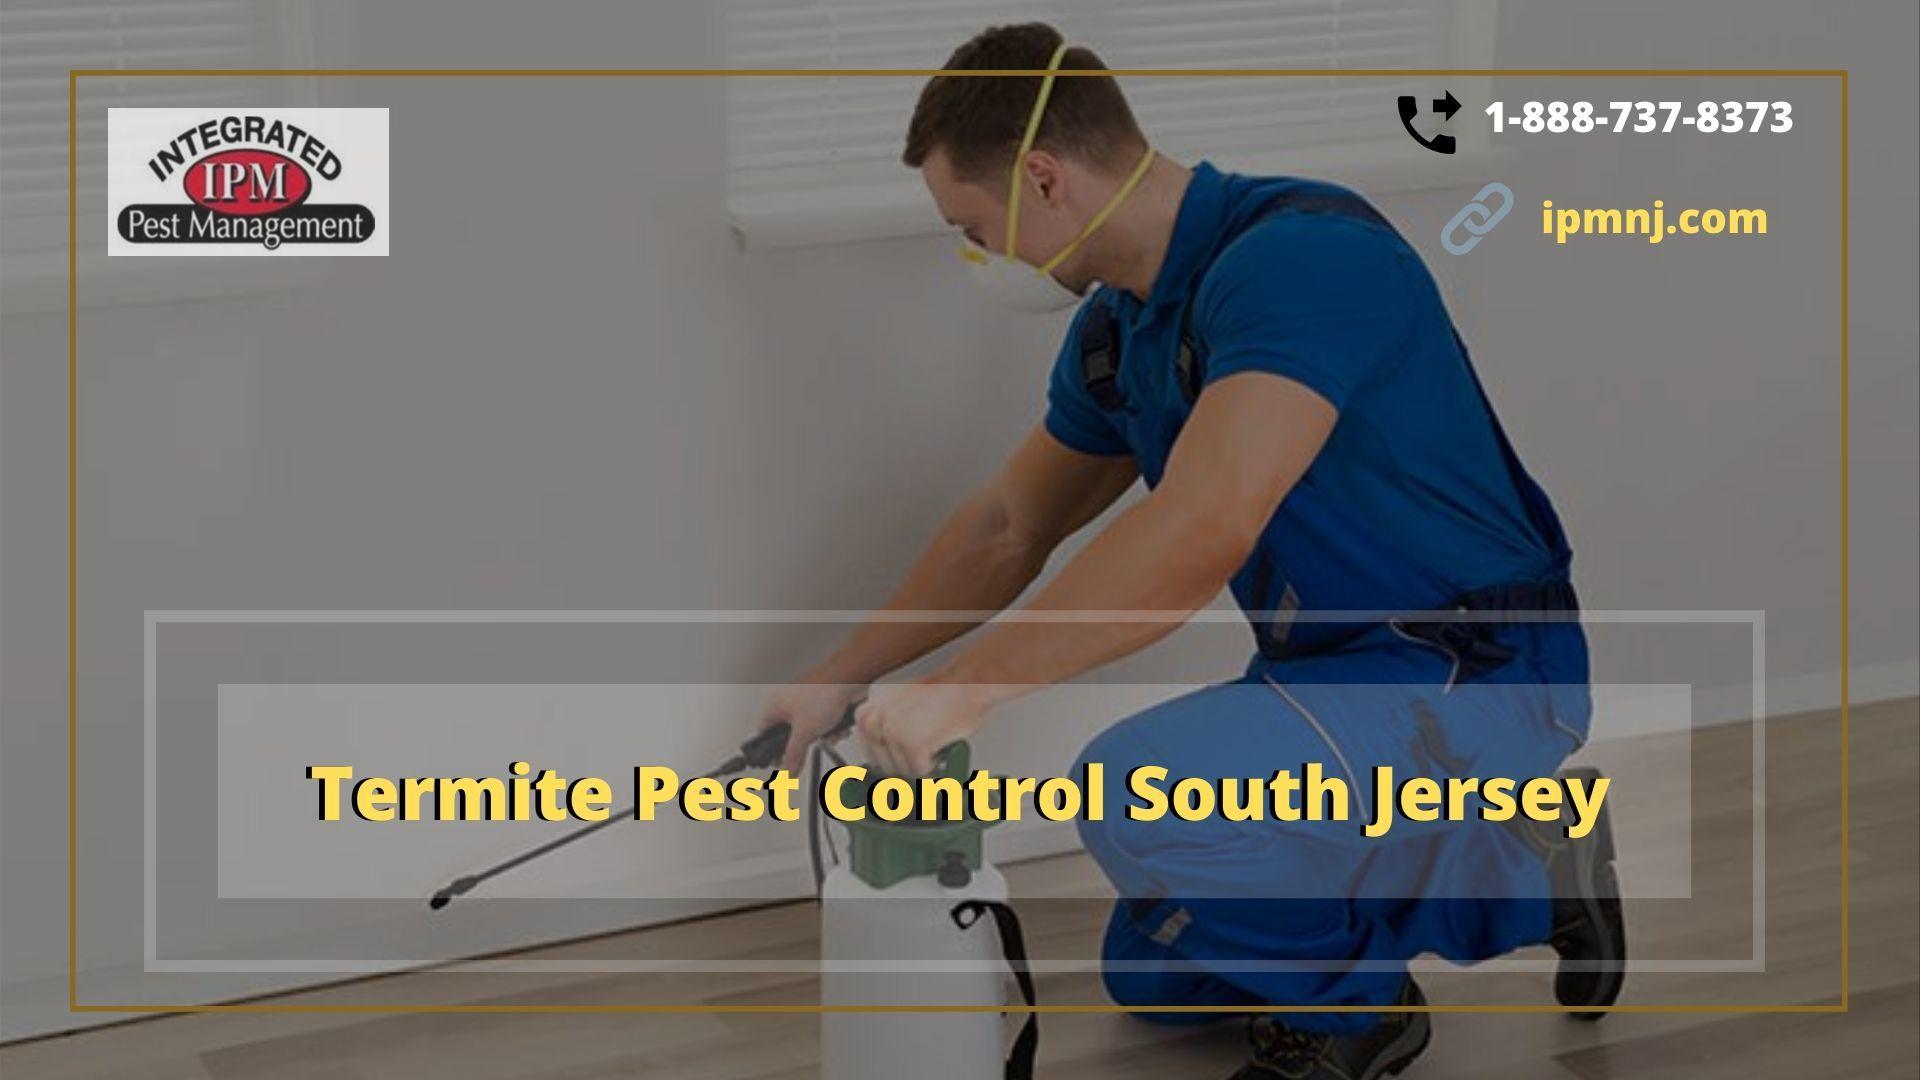 Termite Pest Control South Jersey - Gifyu